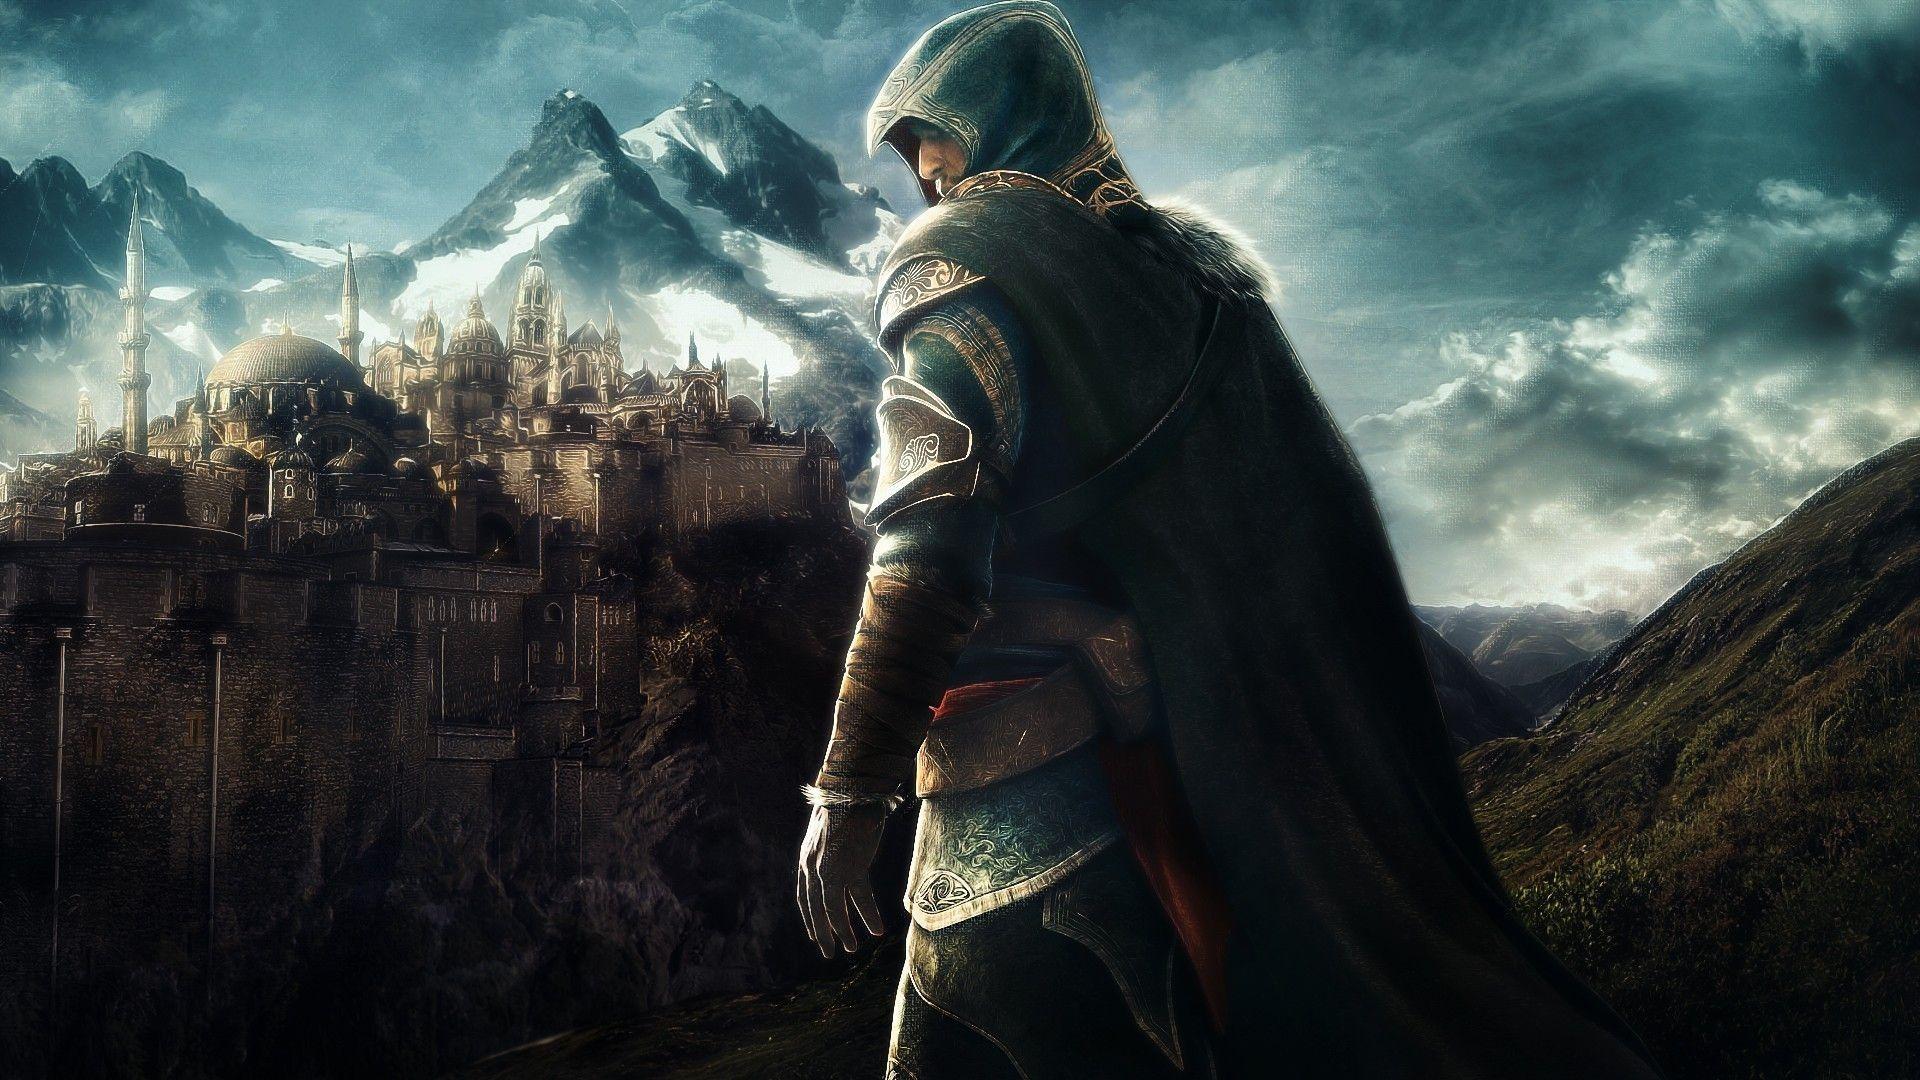 10 Most Popular Imagenes Full Hd 1080p Wallpapers Games Full Hd 1080p For Pc Desktop Gaming Wallpapers Best Gaming Wallpapers Pc Games Wallpapers